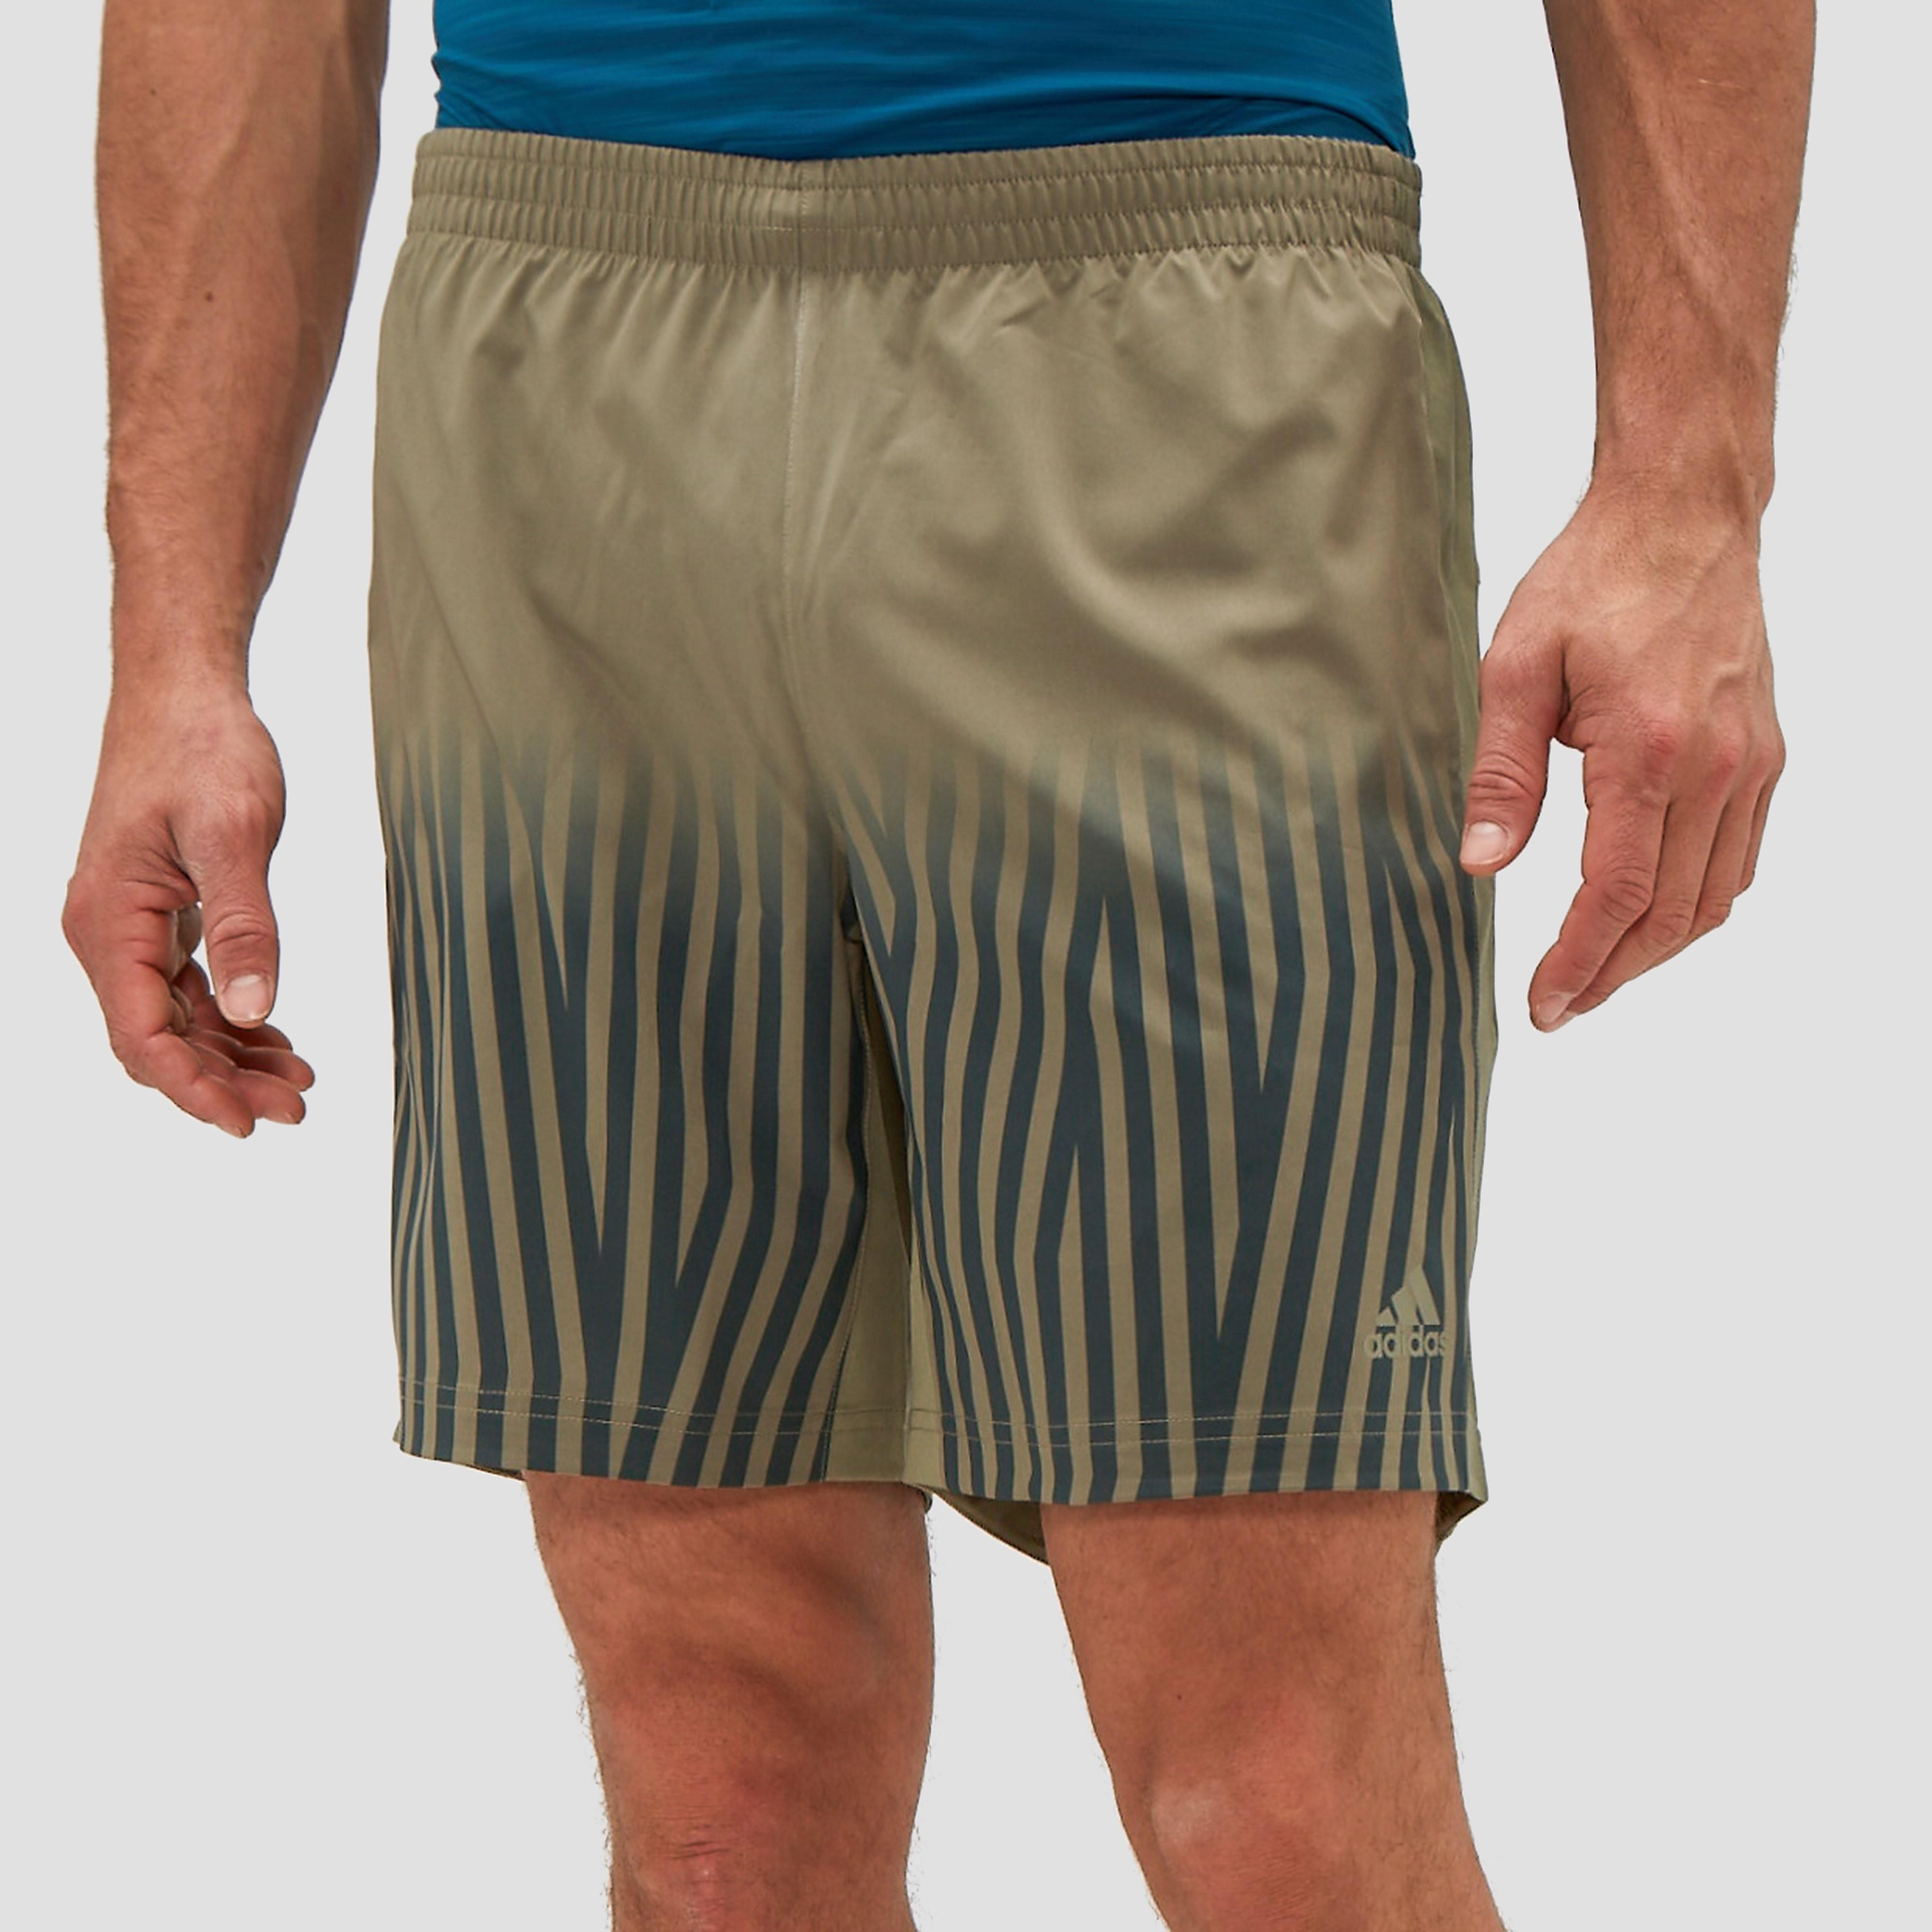 adidas Men's Supernova Print Running Shorts Trace Cargo M